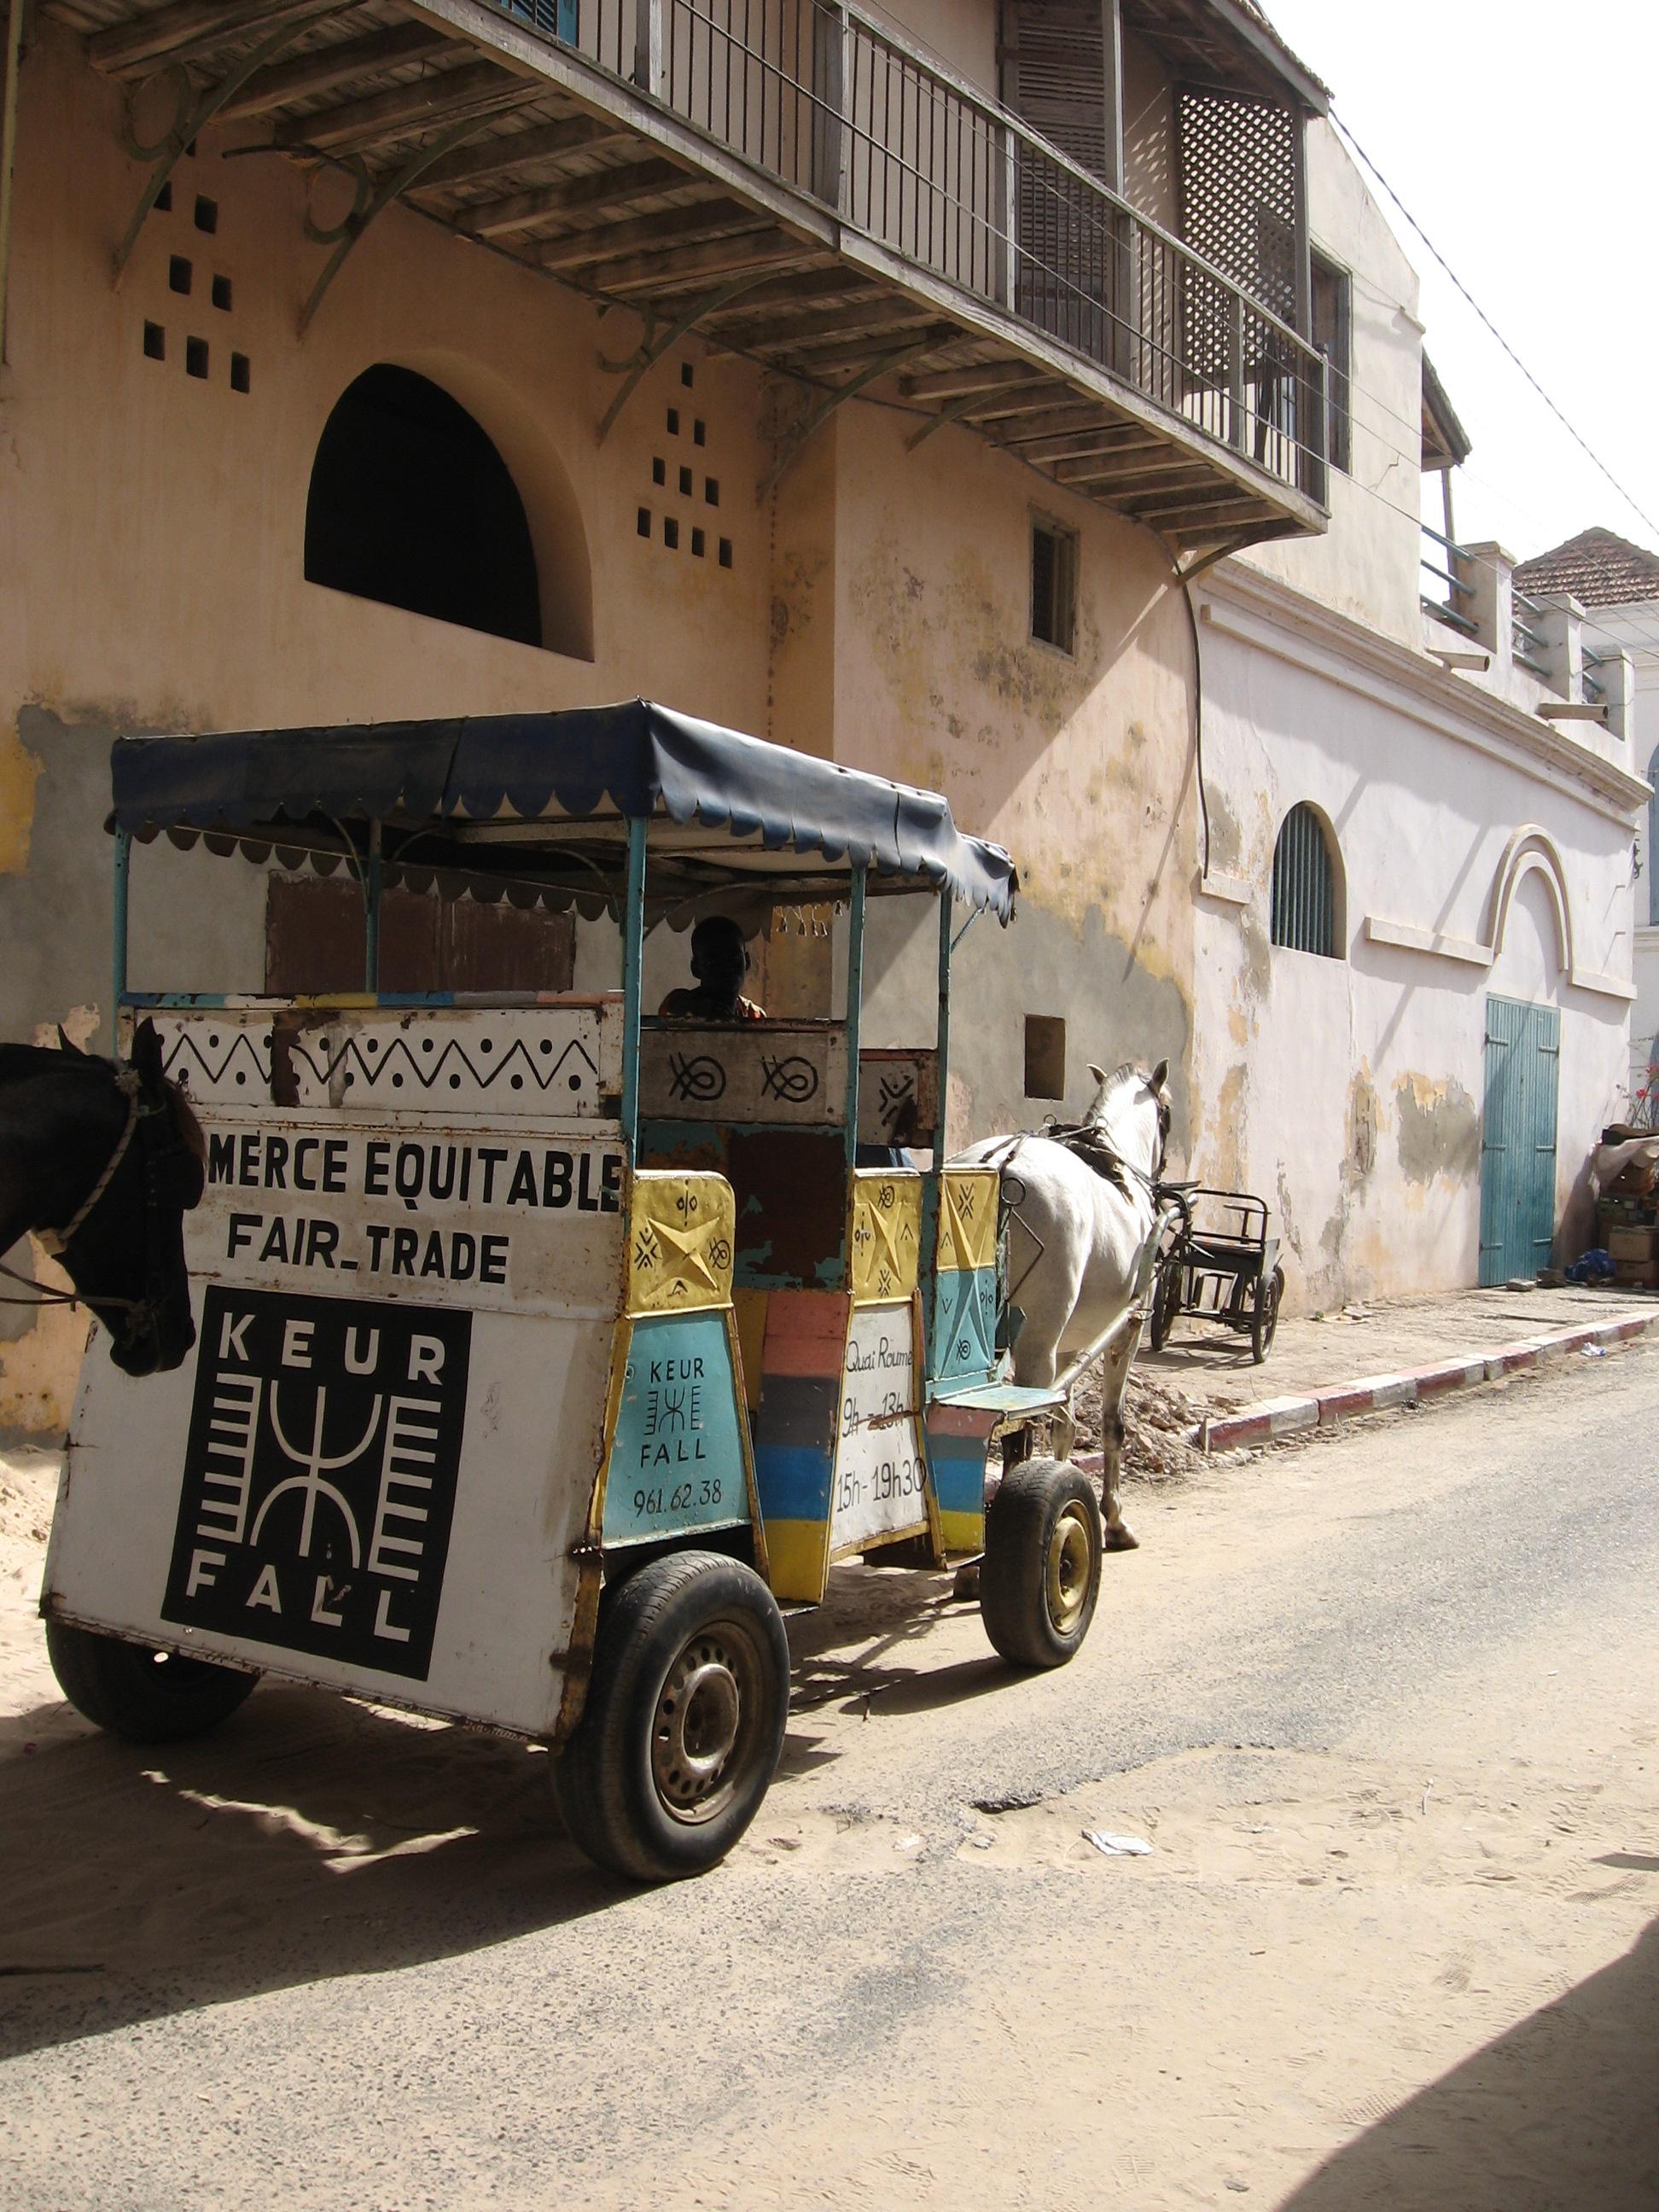 http://upload.wikimedia.org/wikipedia/commons/c/c6/Saint_louis_Senegal_cart_2006.jpg